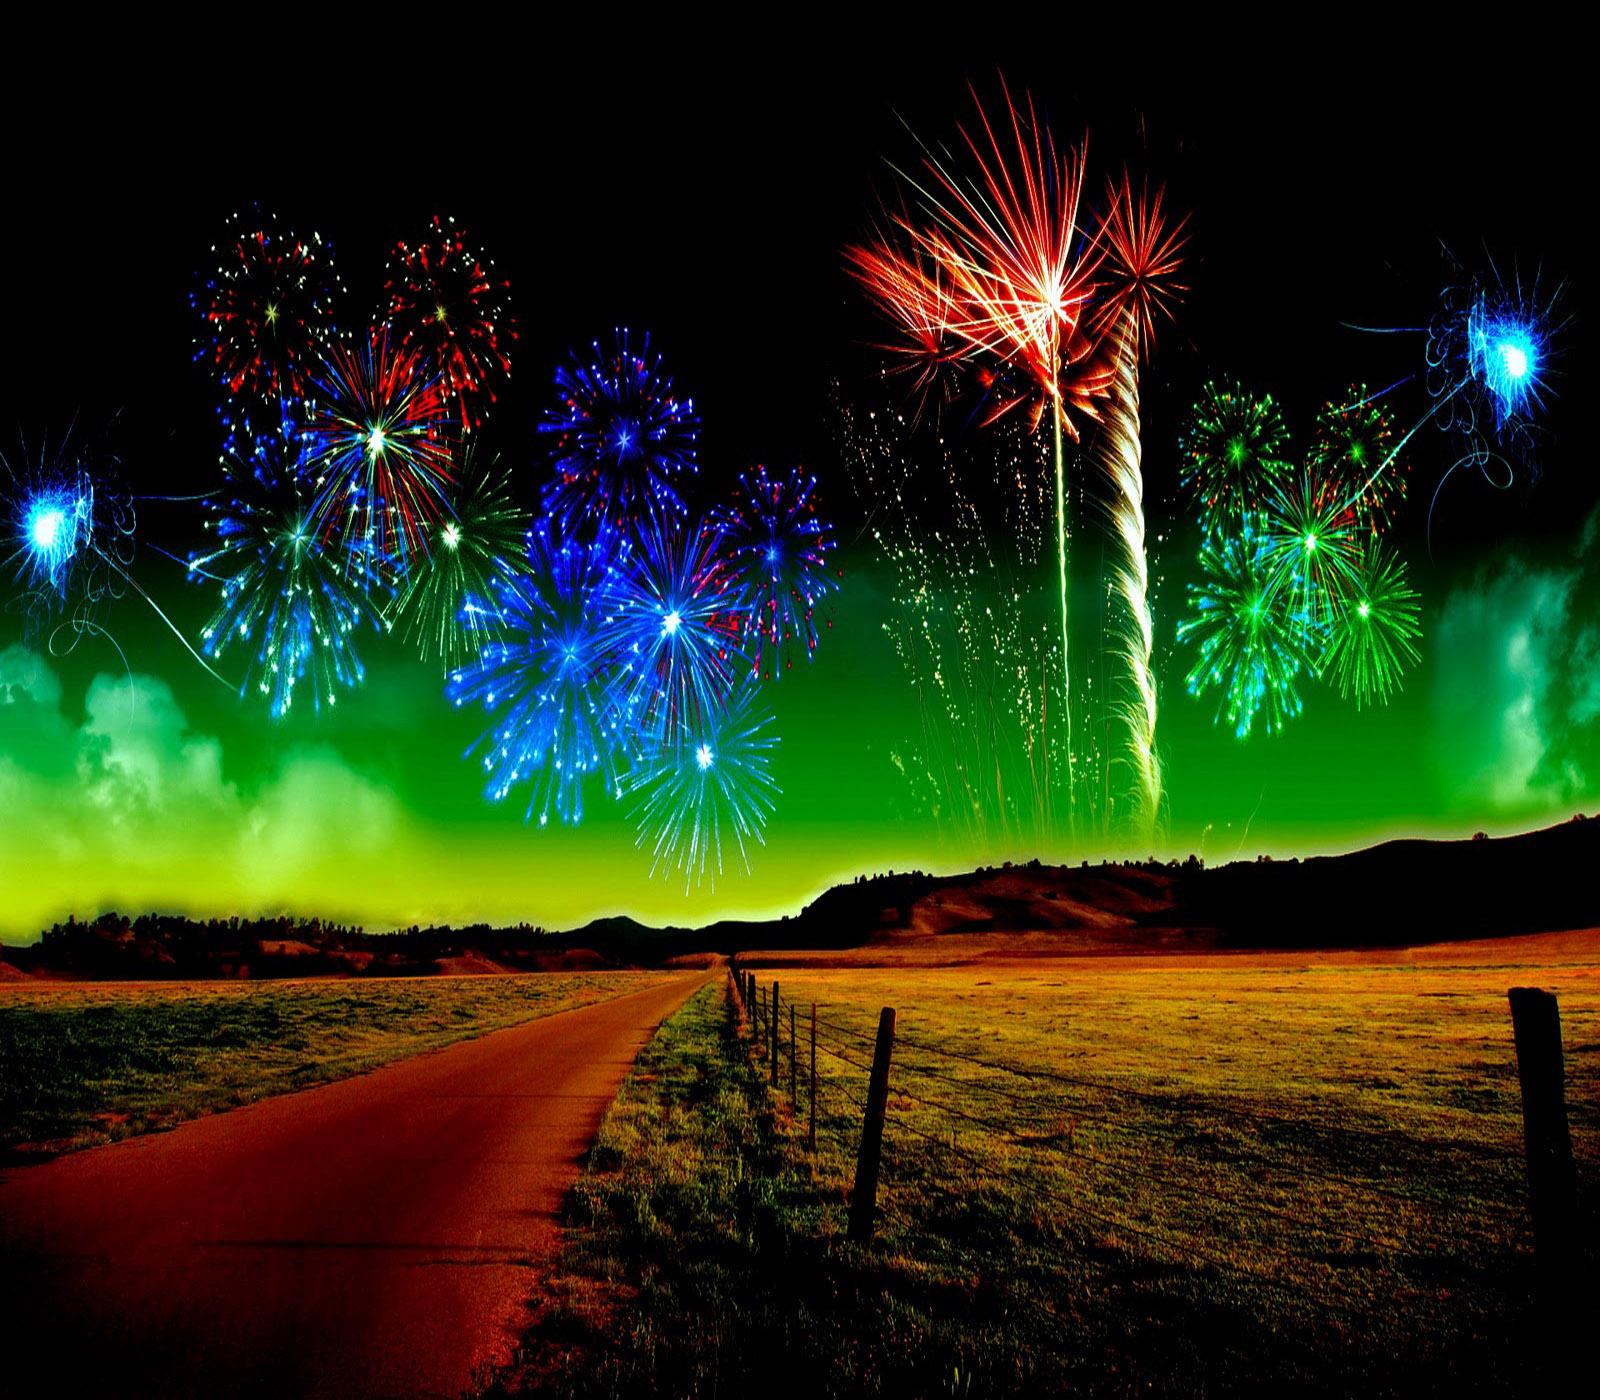 Desktop Wallpaper New: Happy-New-Year-2014-Fireworks-HD-Wallpaper-For-Desktop-1.jpg